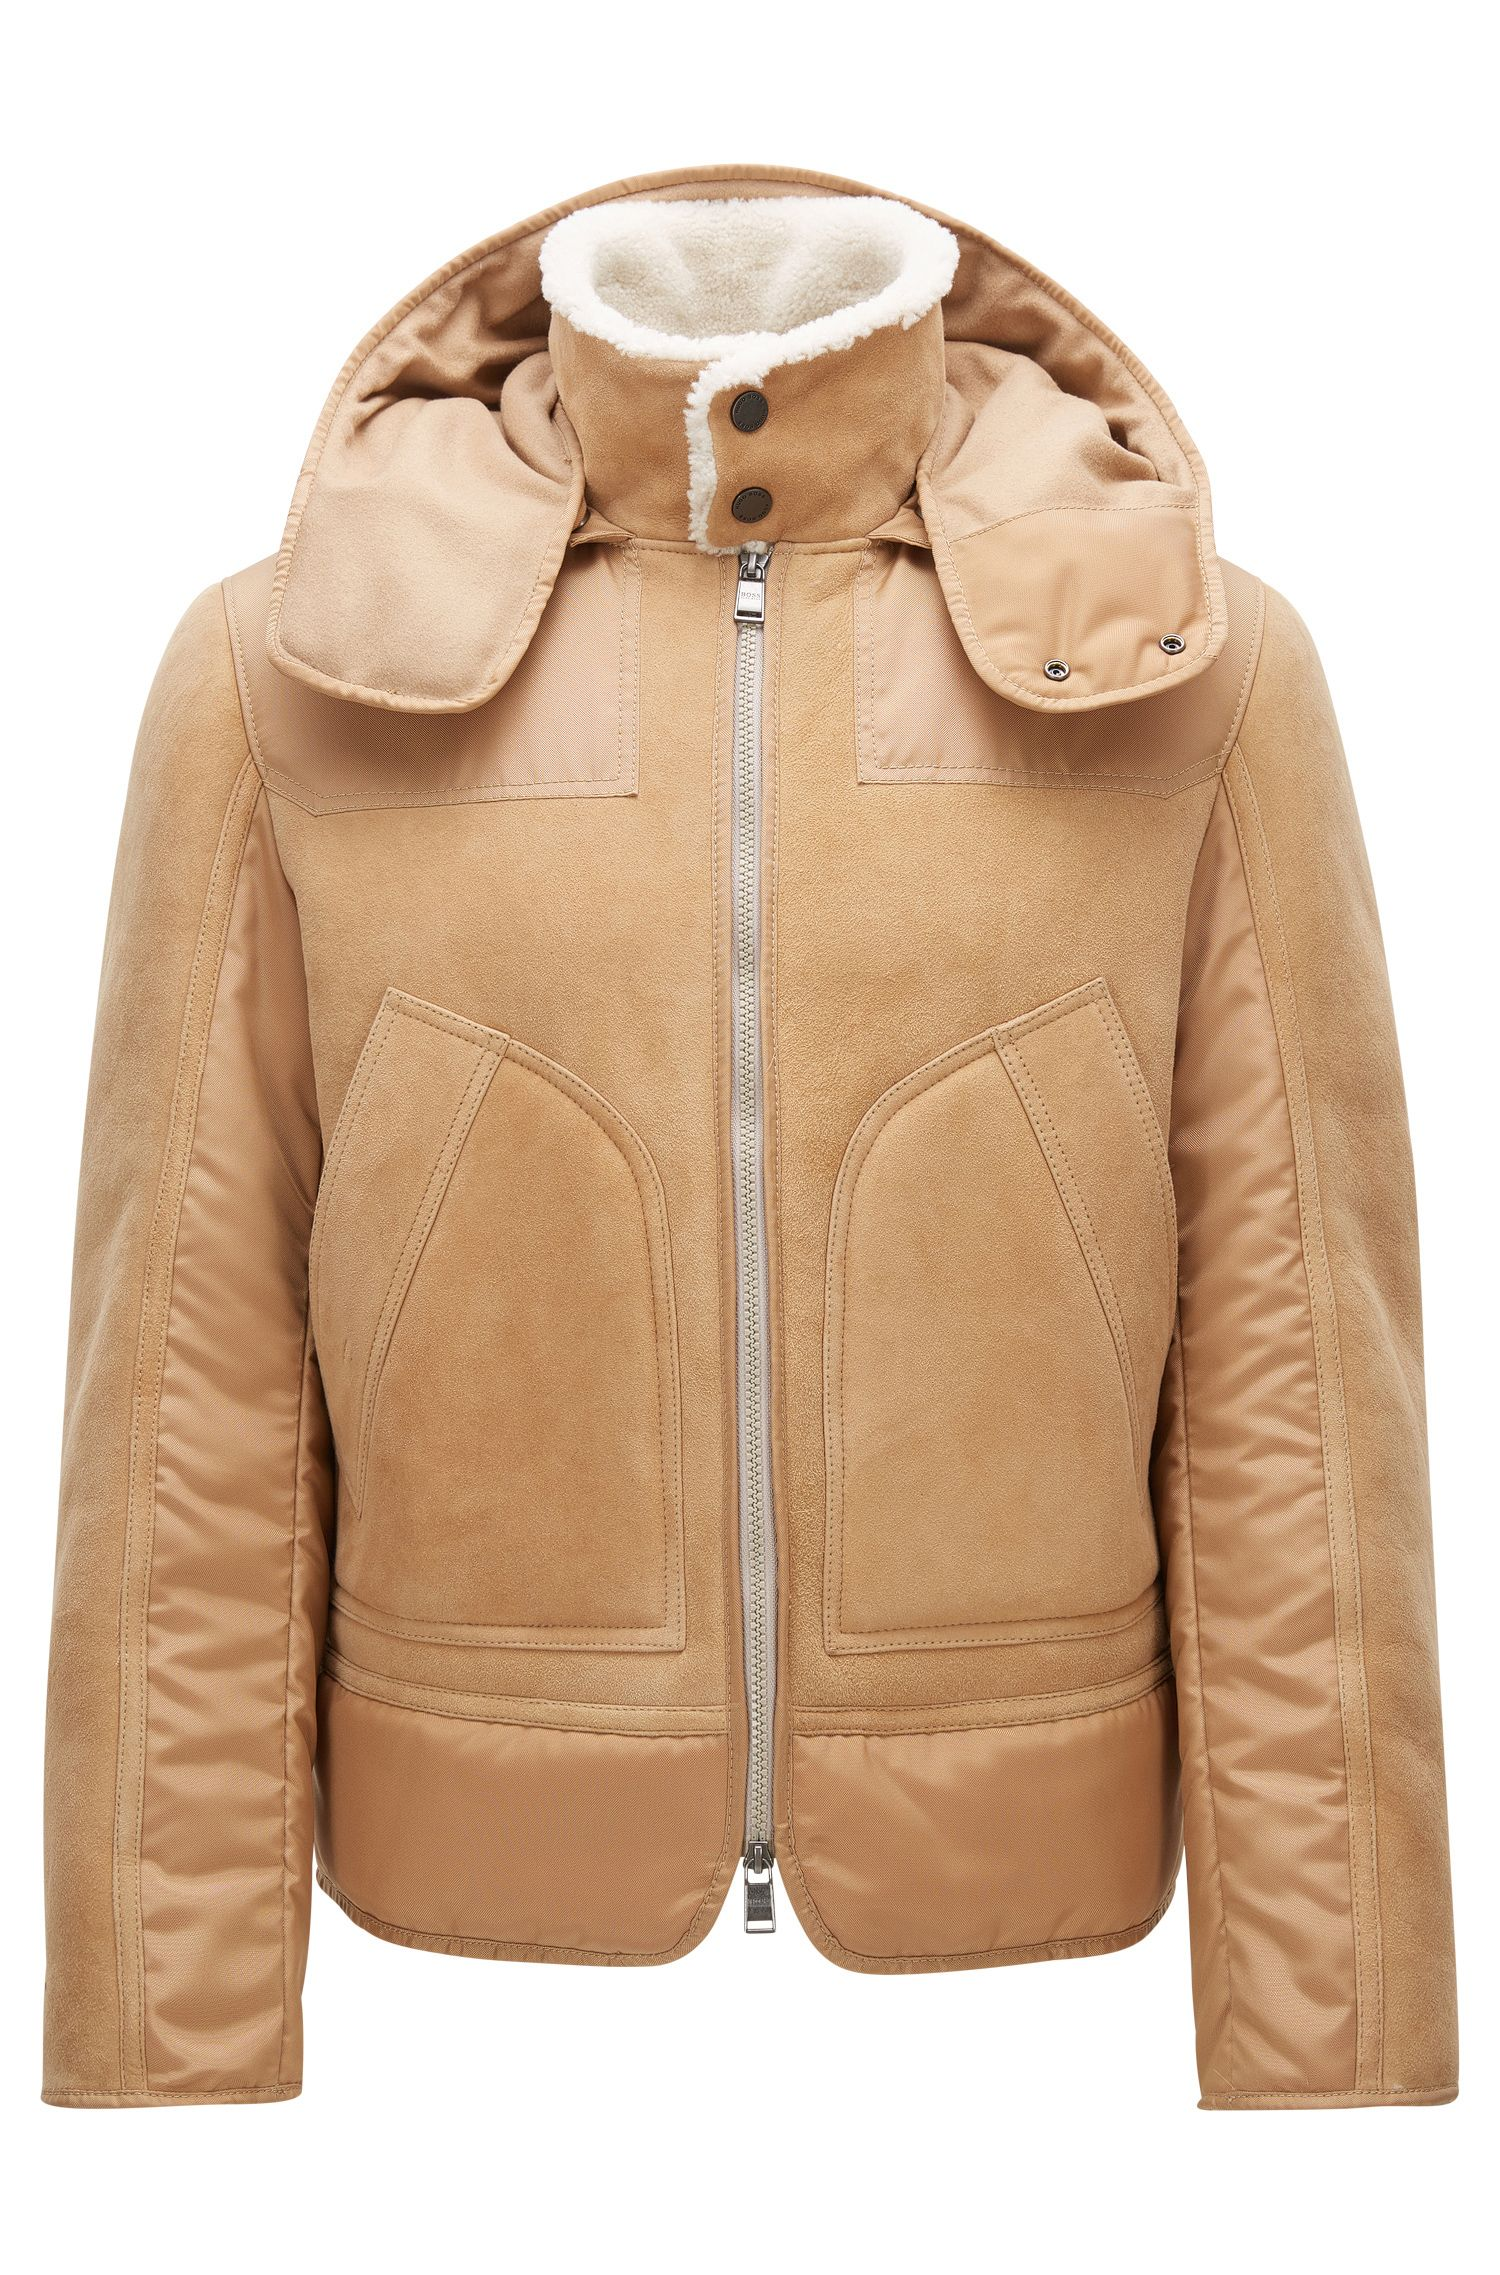 Regular-fit heavyweight lambskin leather jacket with detachable hood